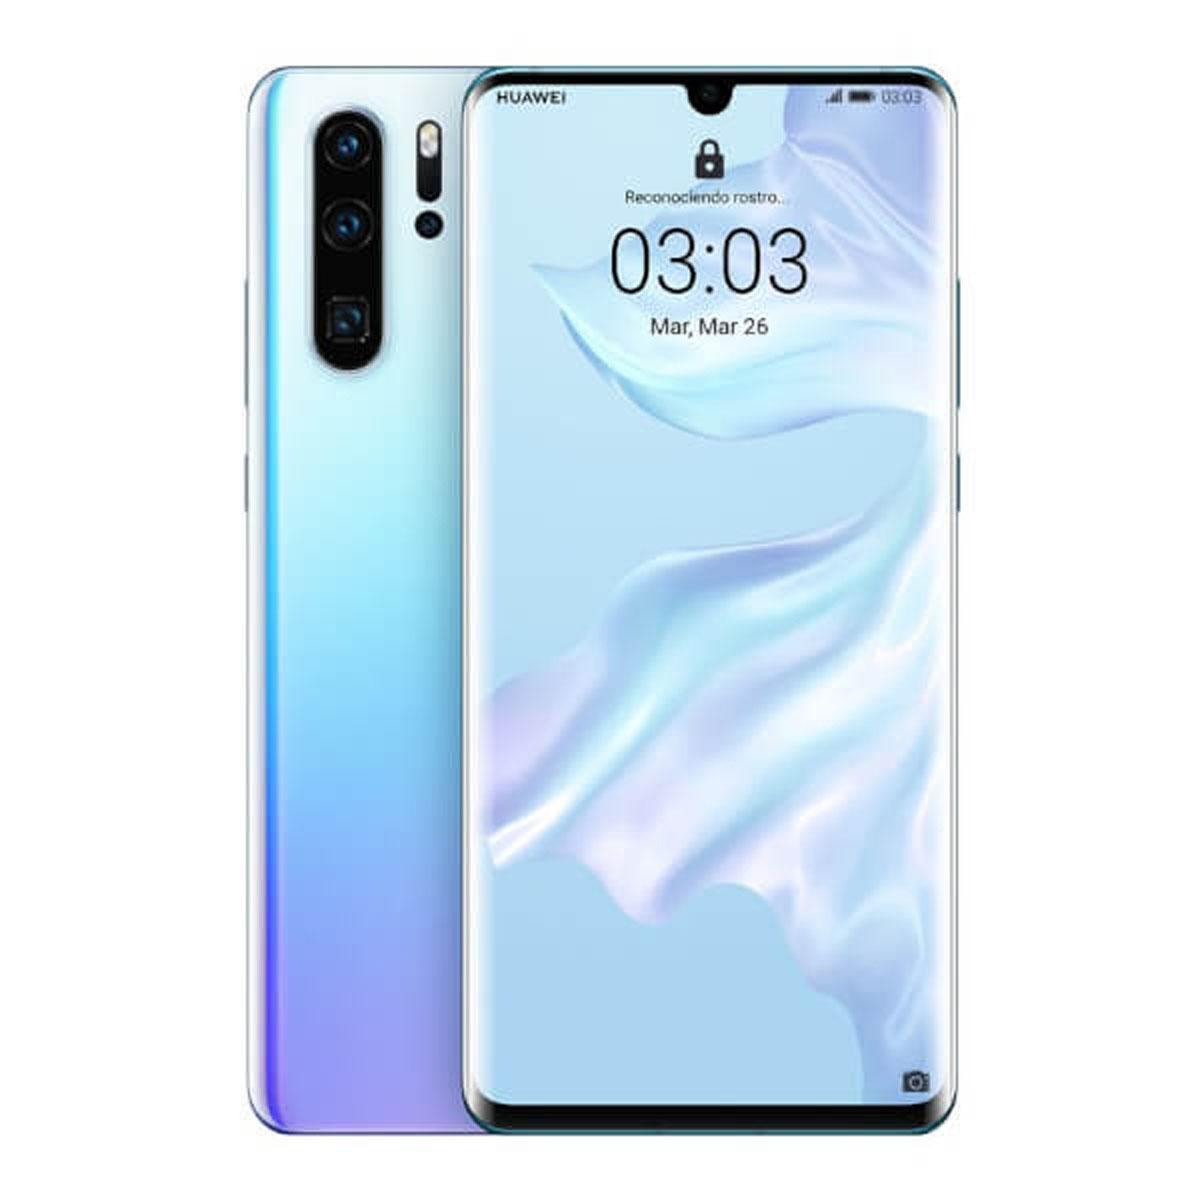 Huawei p30 pro 8gb/128gb breathing crystal